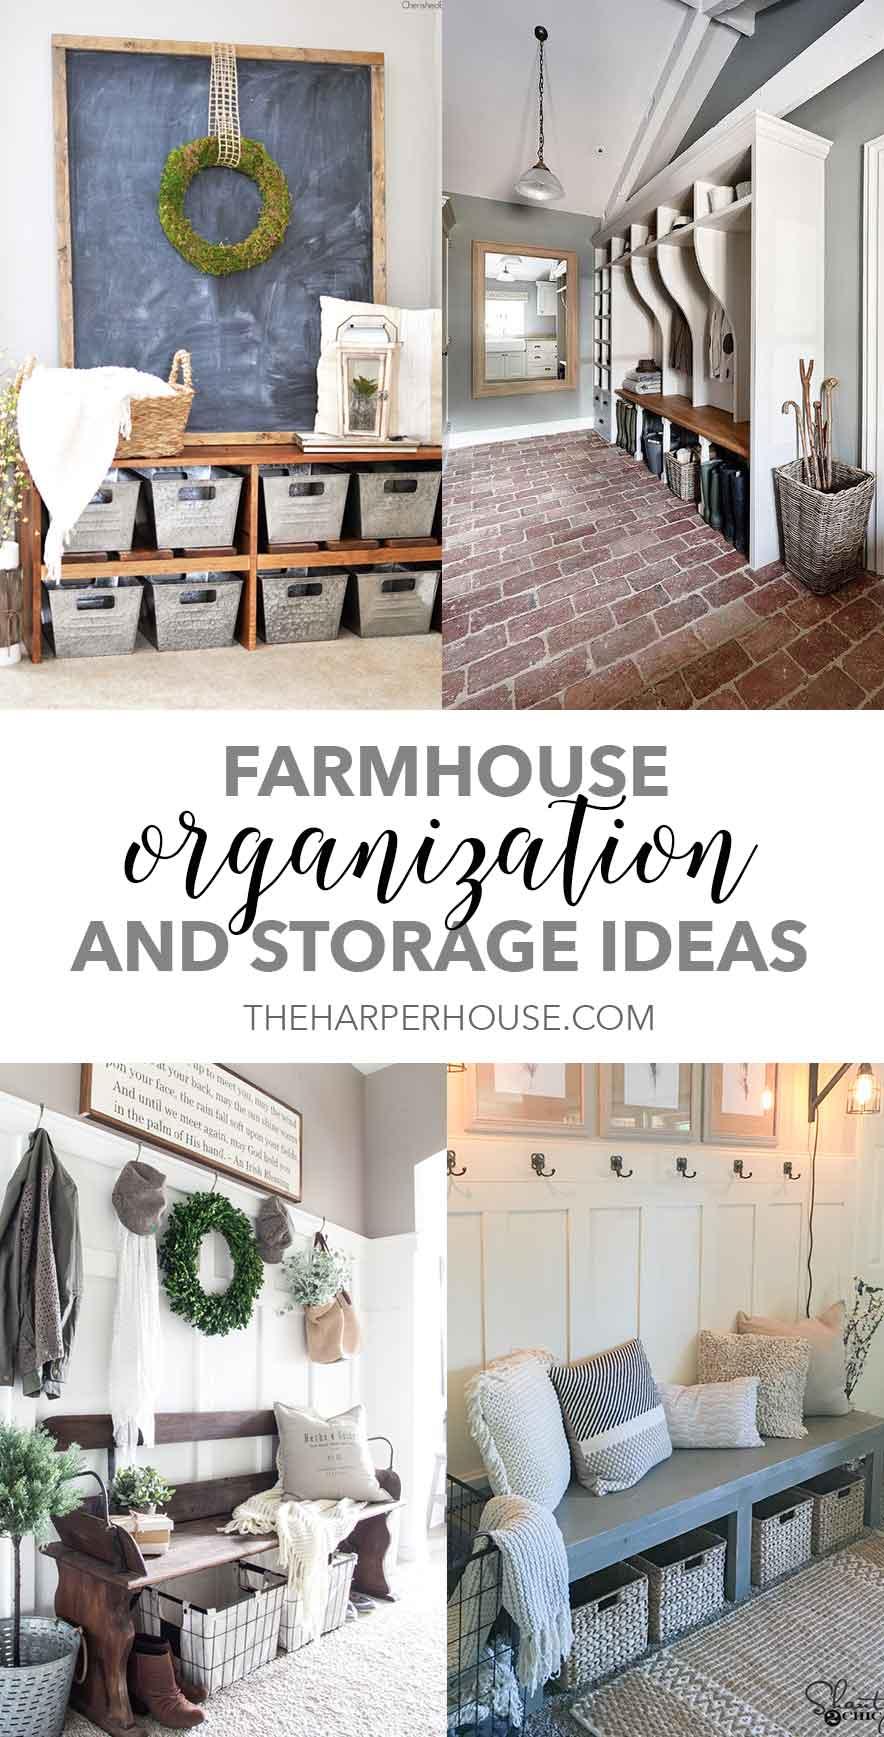 Farmhouse Storage and Organization Ideas